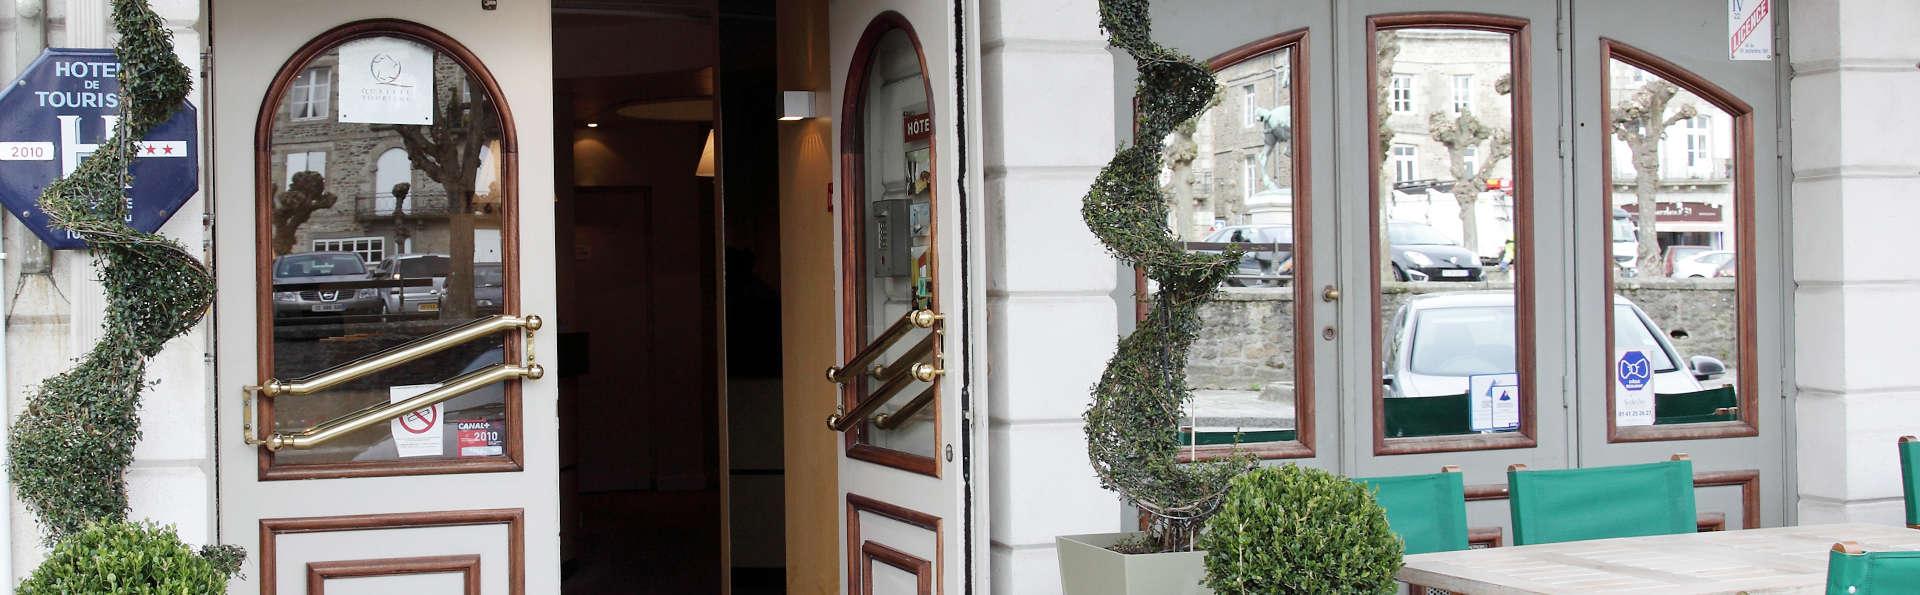 Hôtel Le Challonge - EDIT_entry.jpg